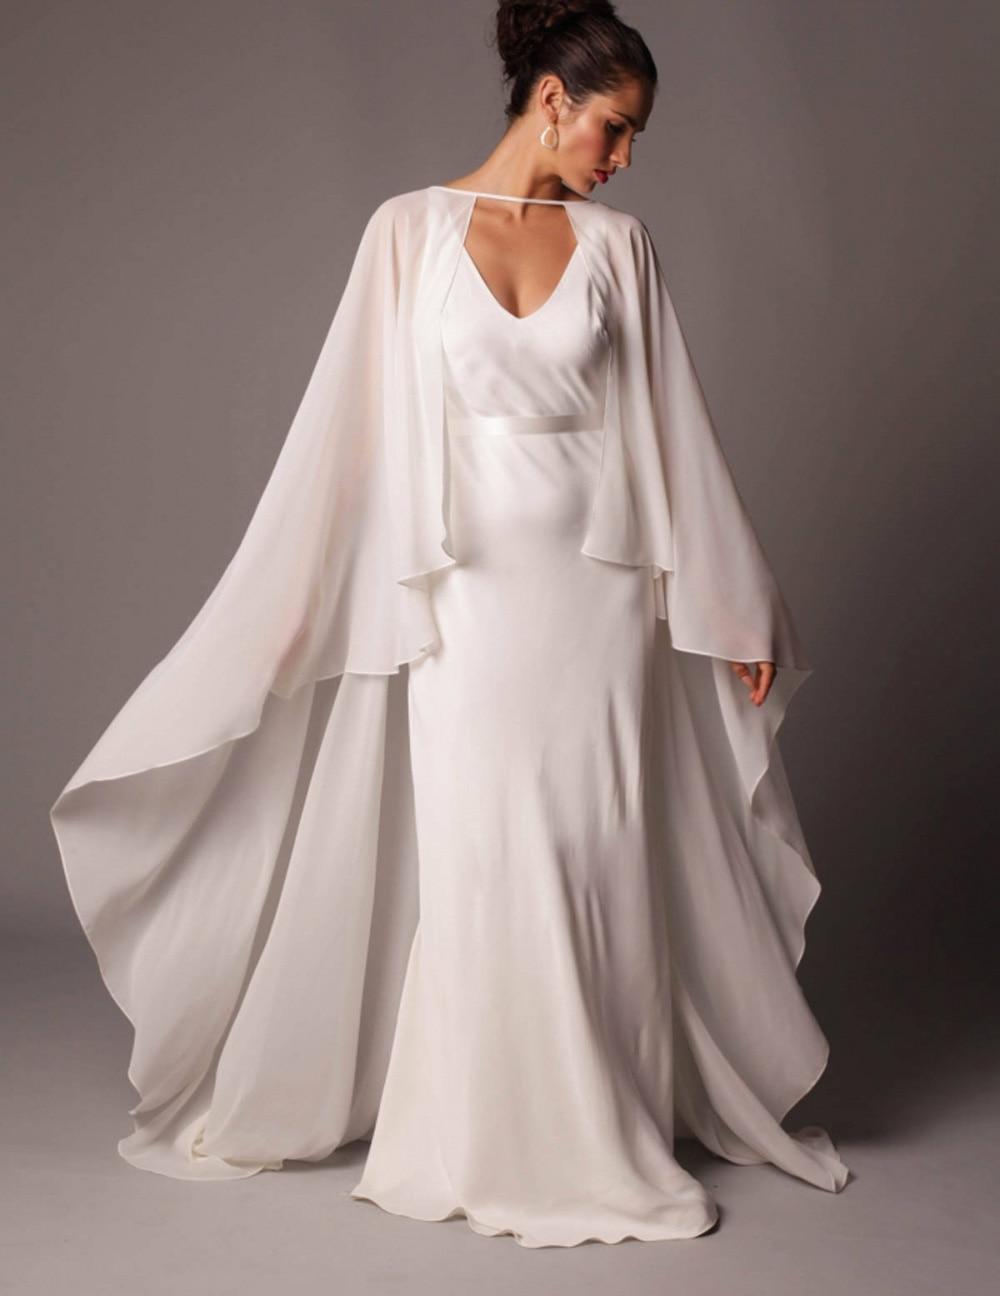 Chiffon Long Gauze Shawl Wrapped In BOLERO Floor-Length Bridal Wedding Jacket New Wedding Capes